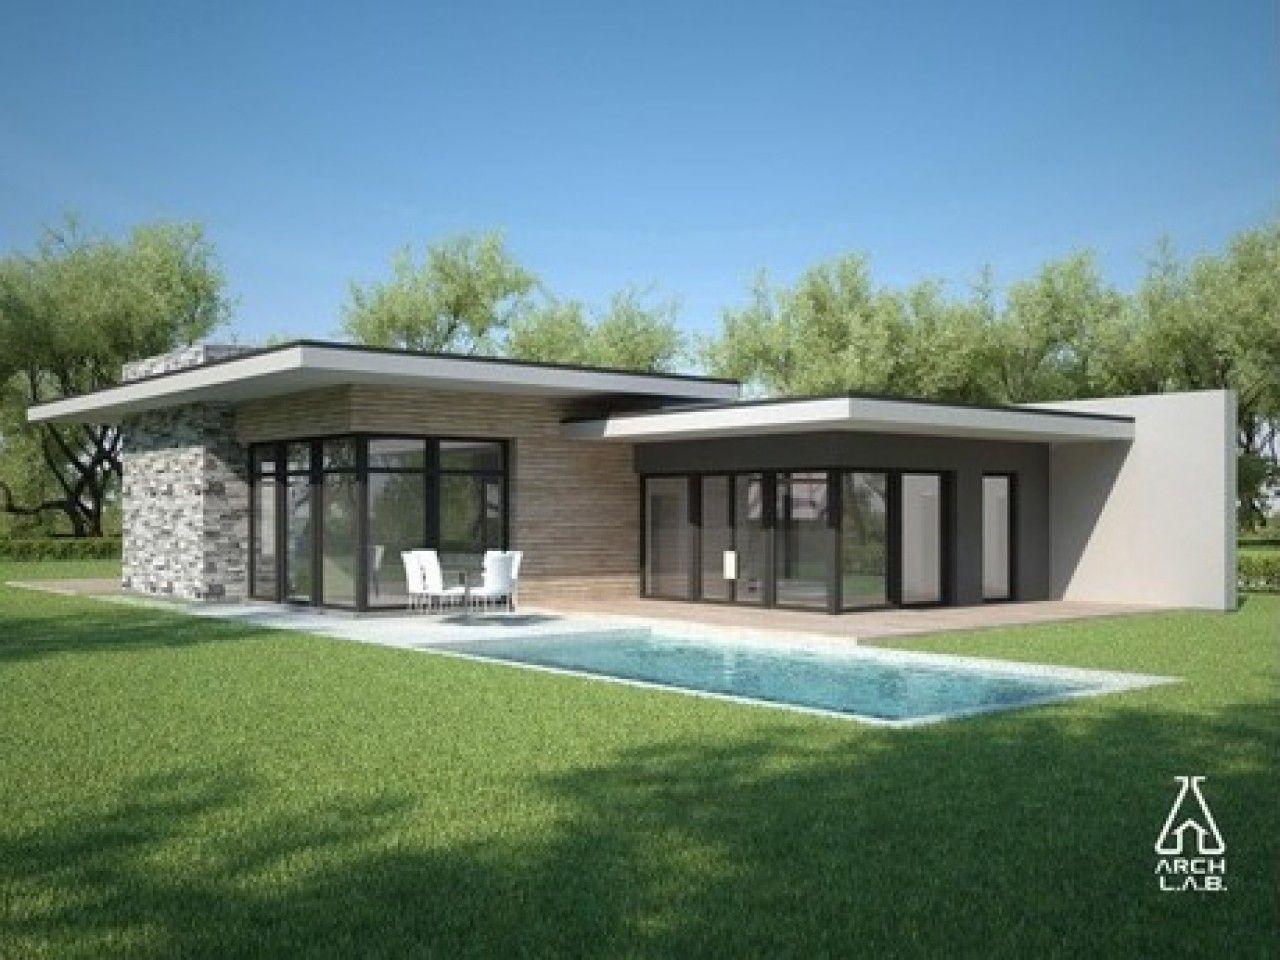 Modern Flat Roof House Plans New Modern Single Story House Flat